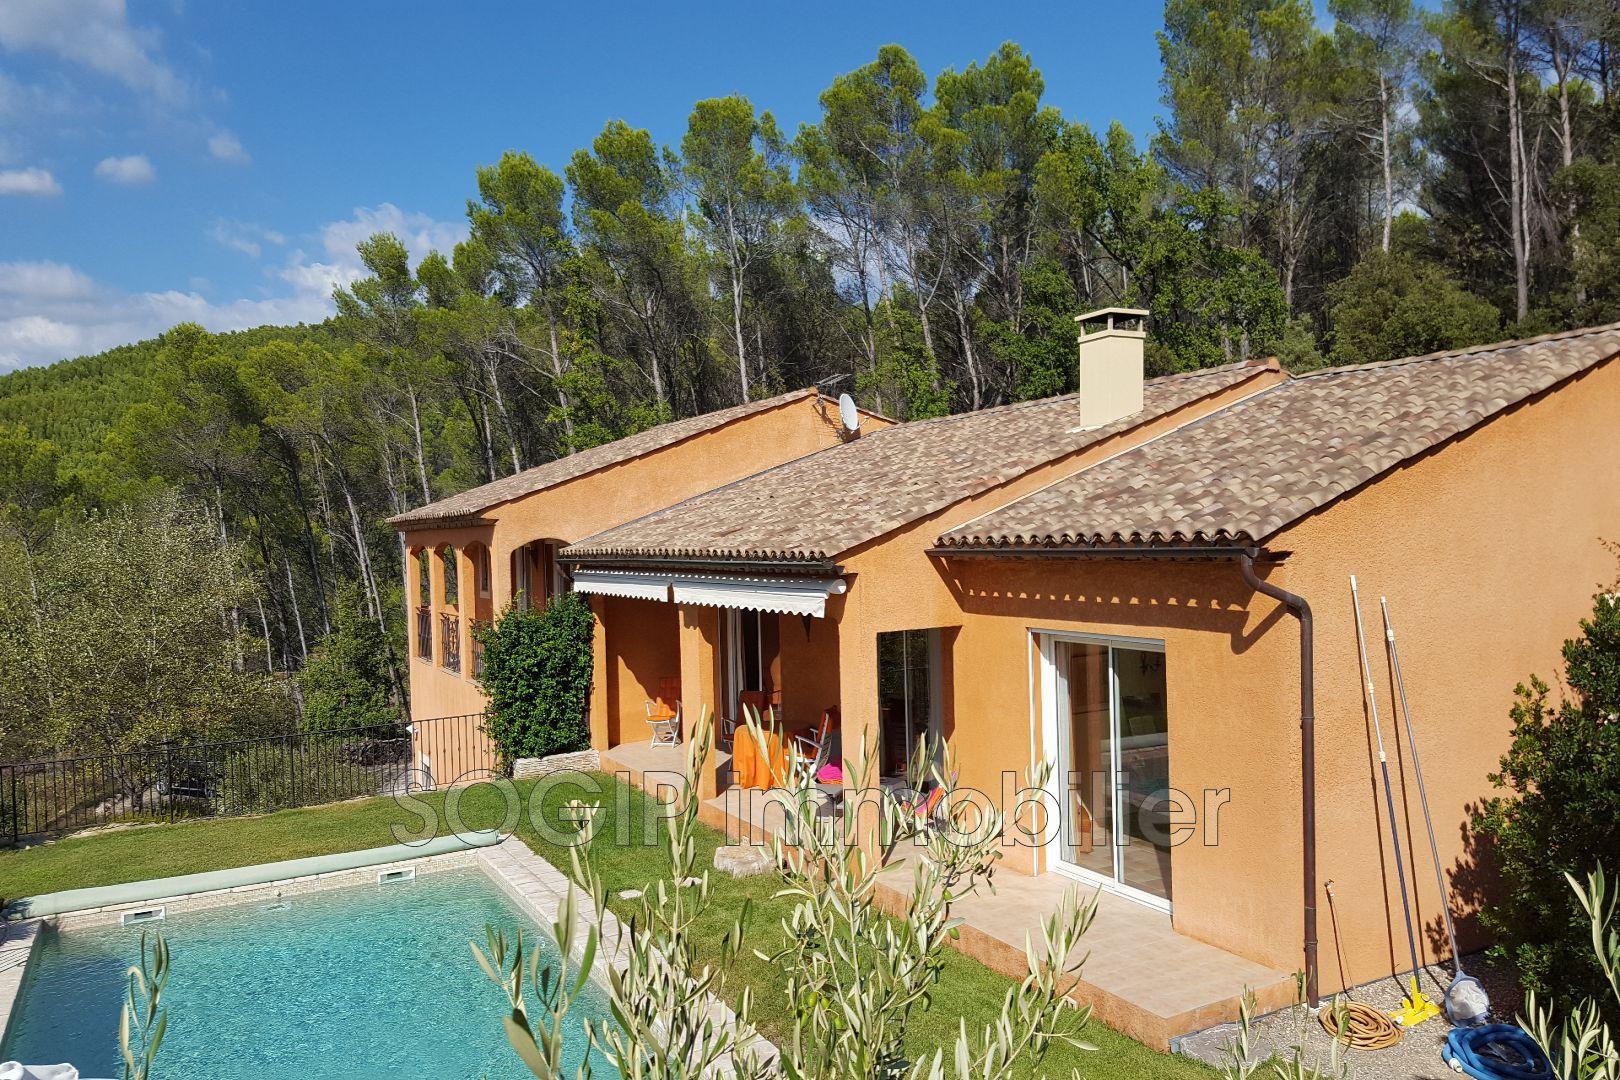 vente maison villa draguignan 83300 679 000. Black Bedroom Furniture Sets. Home Design Ideas